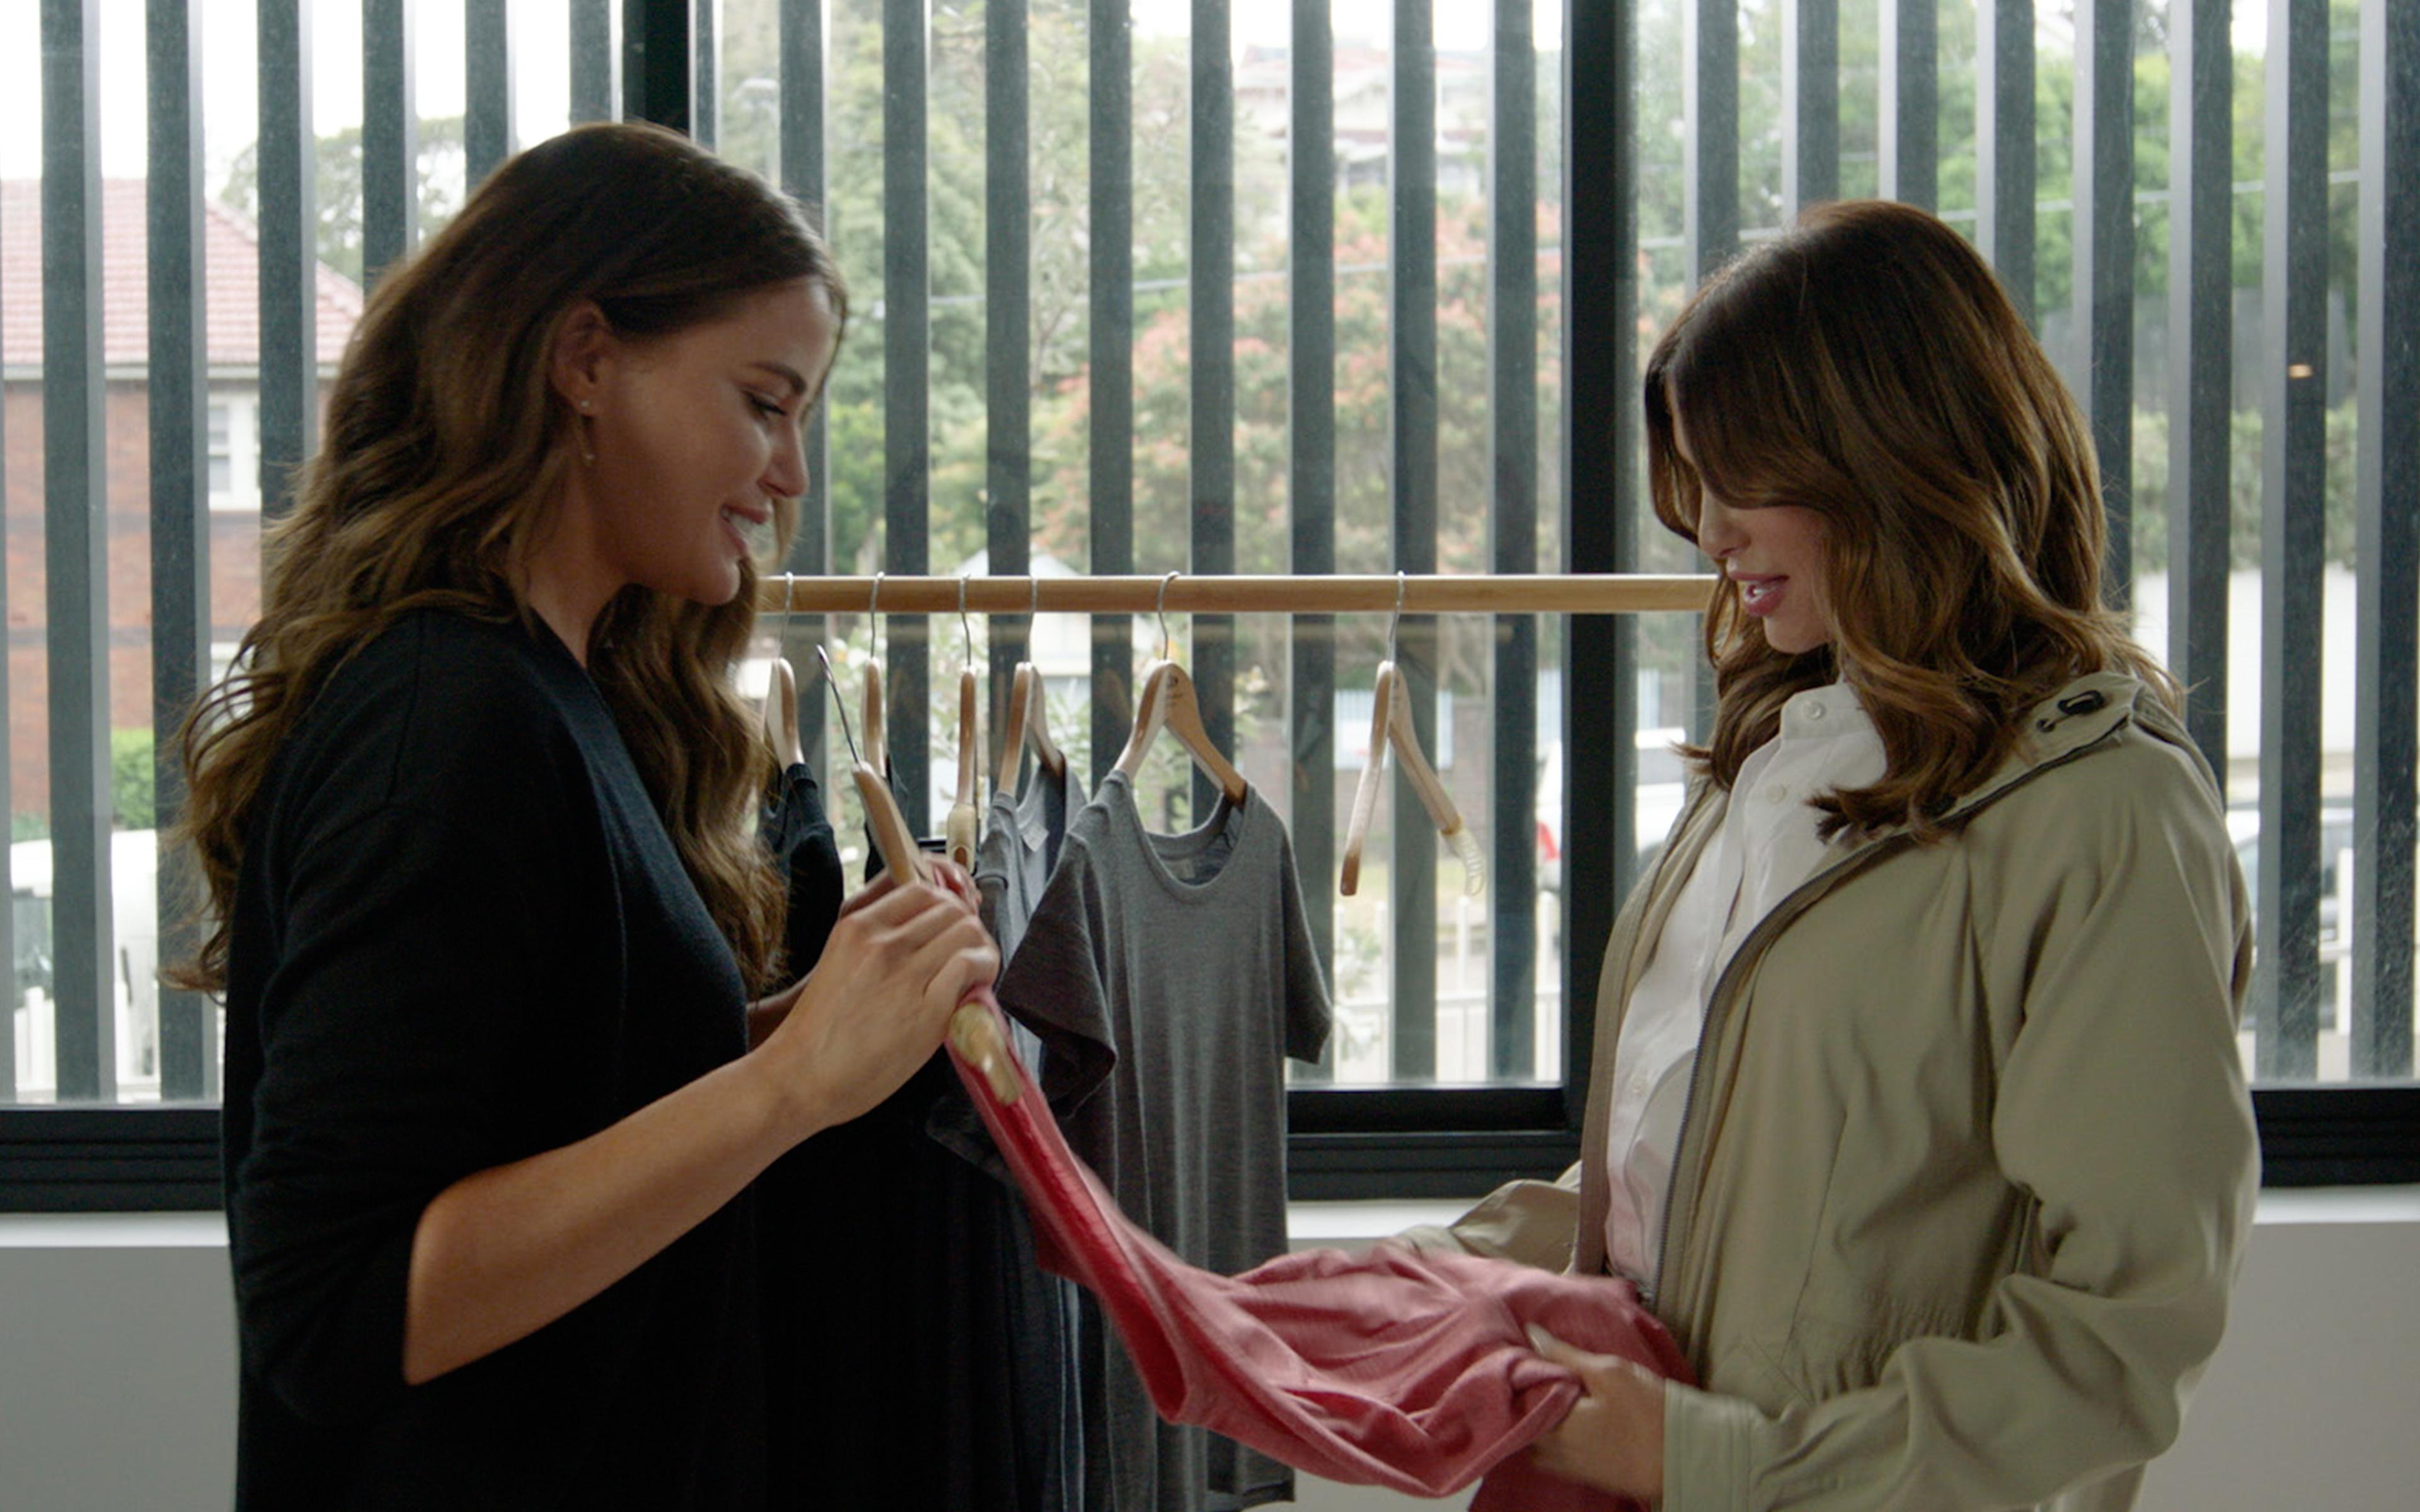 Erin's wardrobe